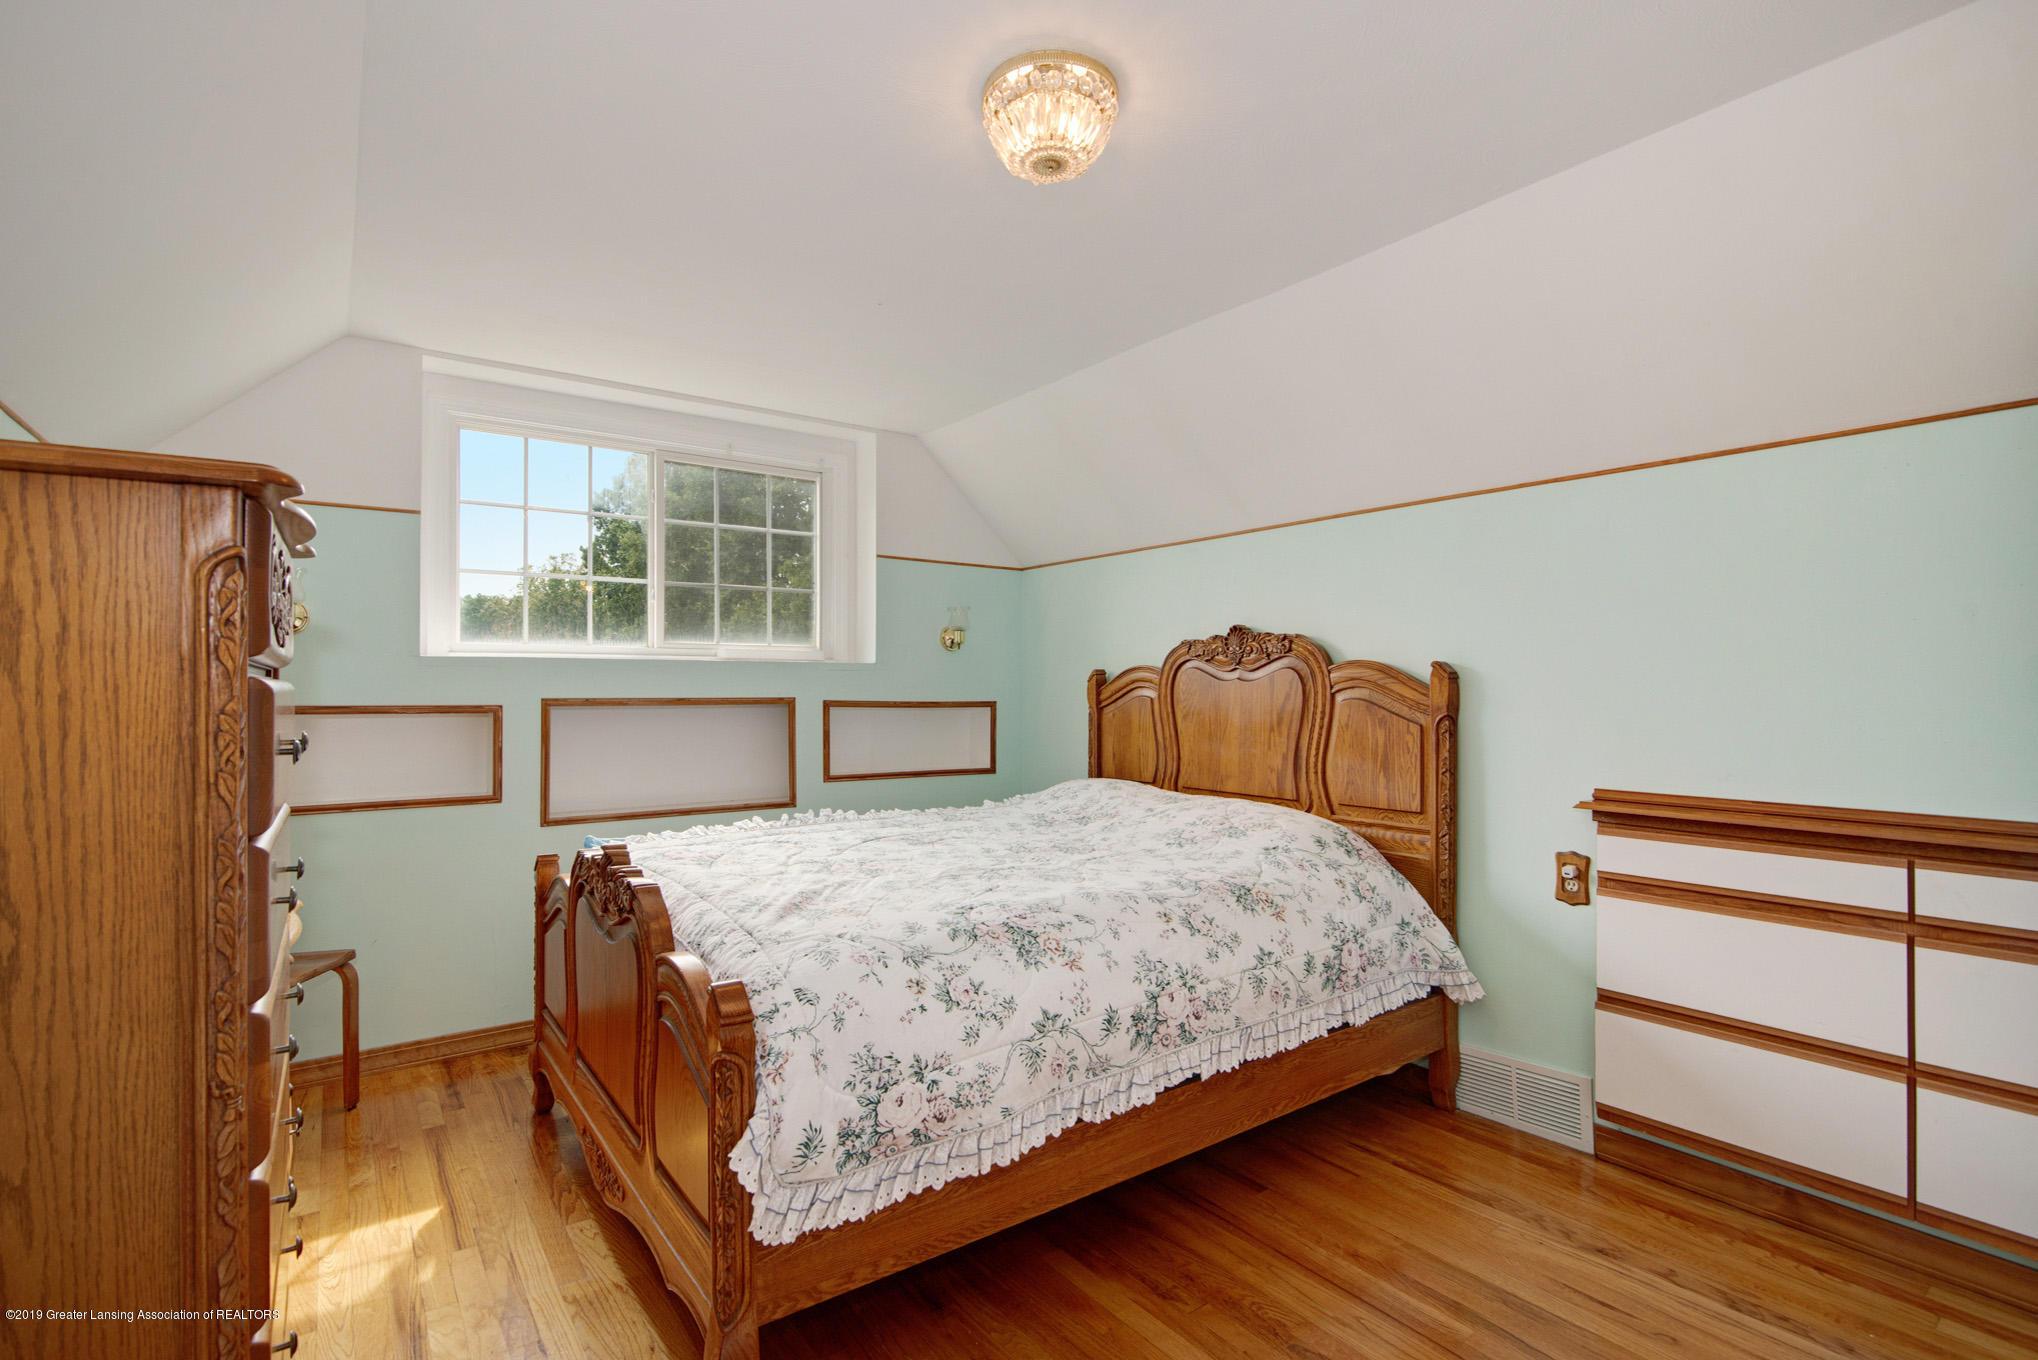 1977 Hamilton St - Bedroom - 22